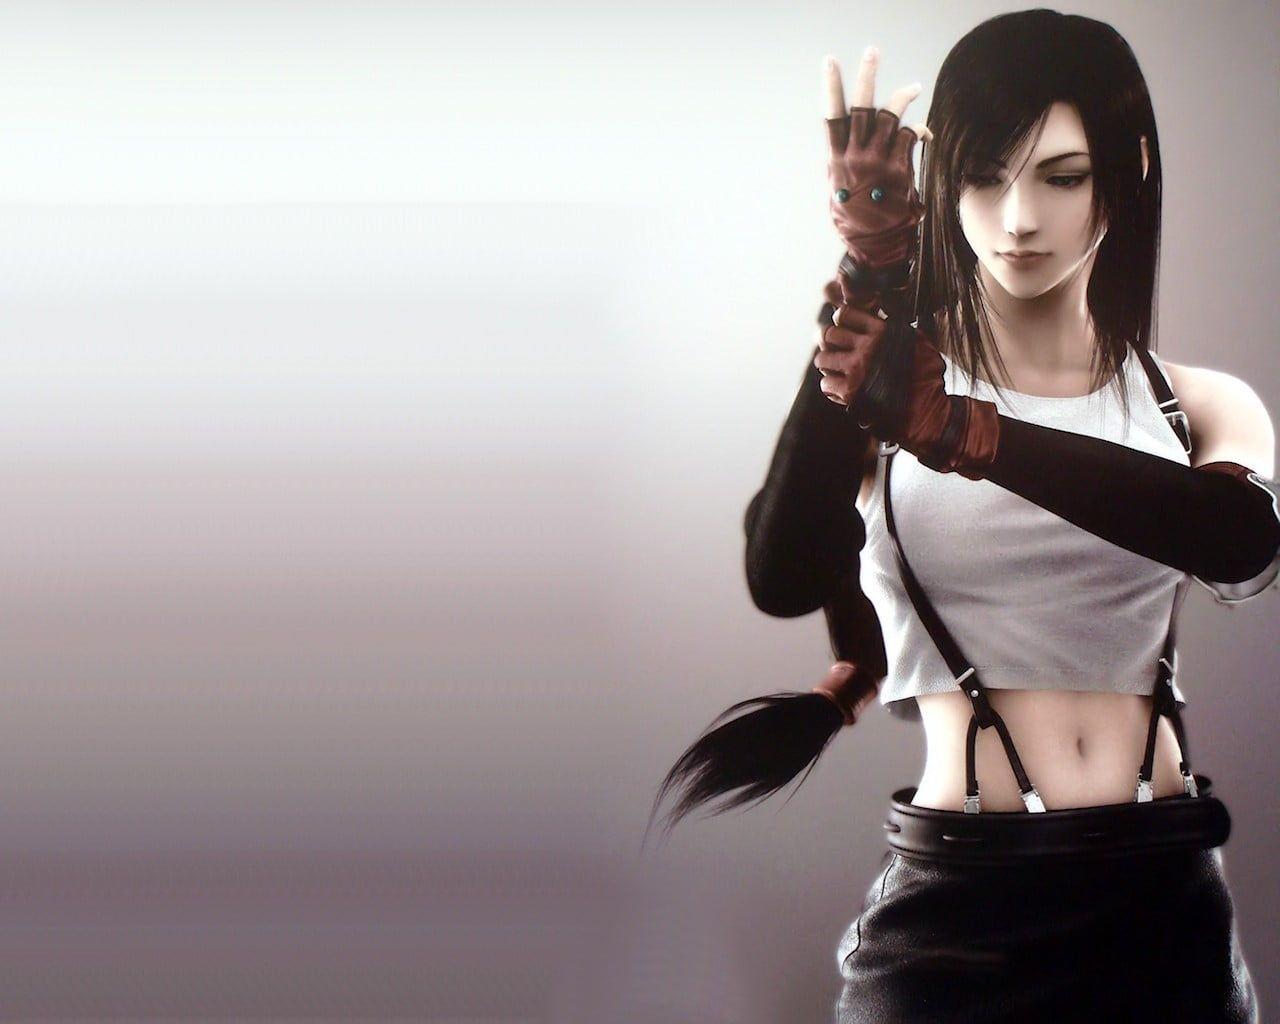 Tifa Lockhart Video Games Tifa Lockhart Final Fantasy Vii 720p